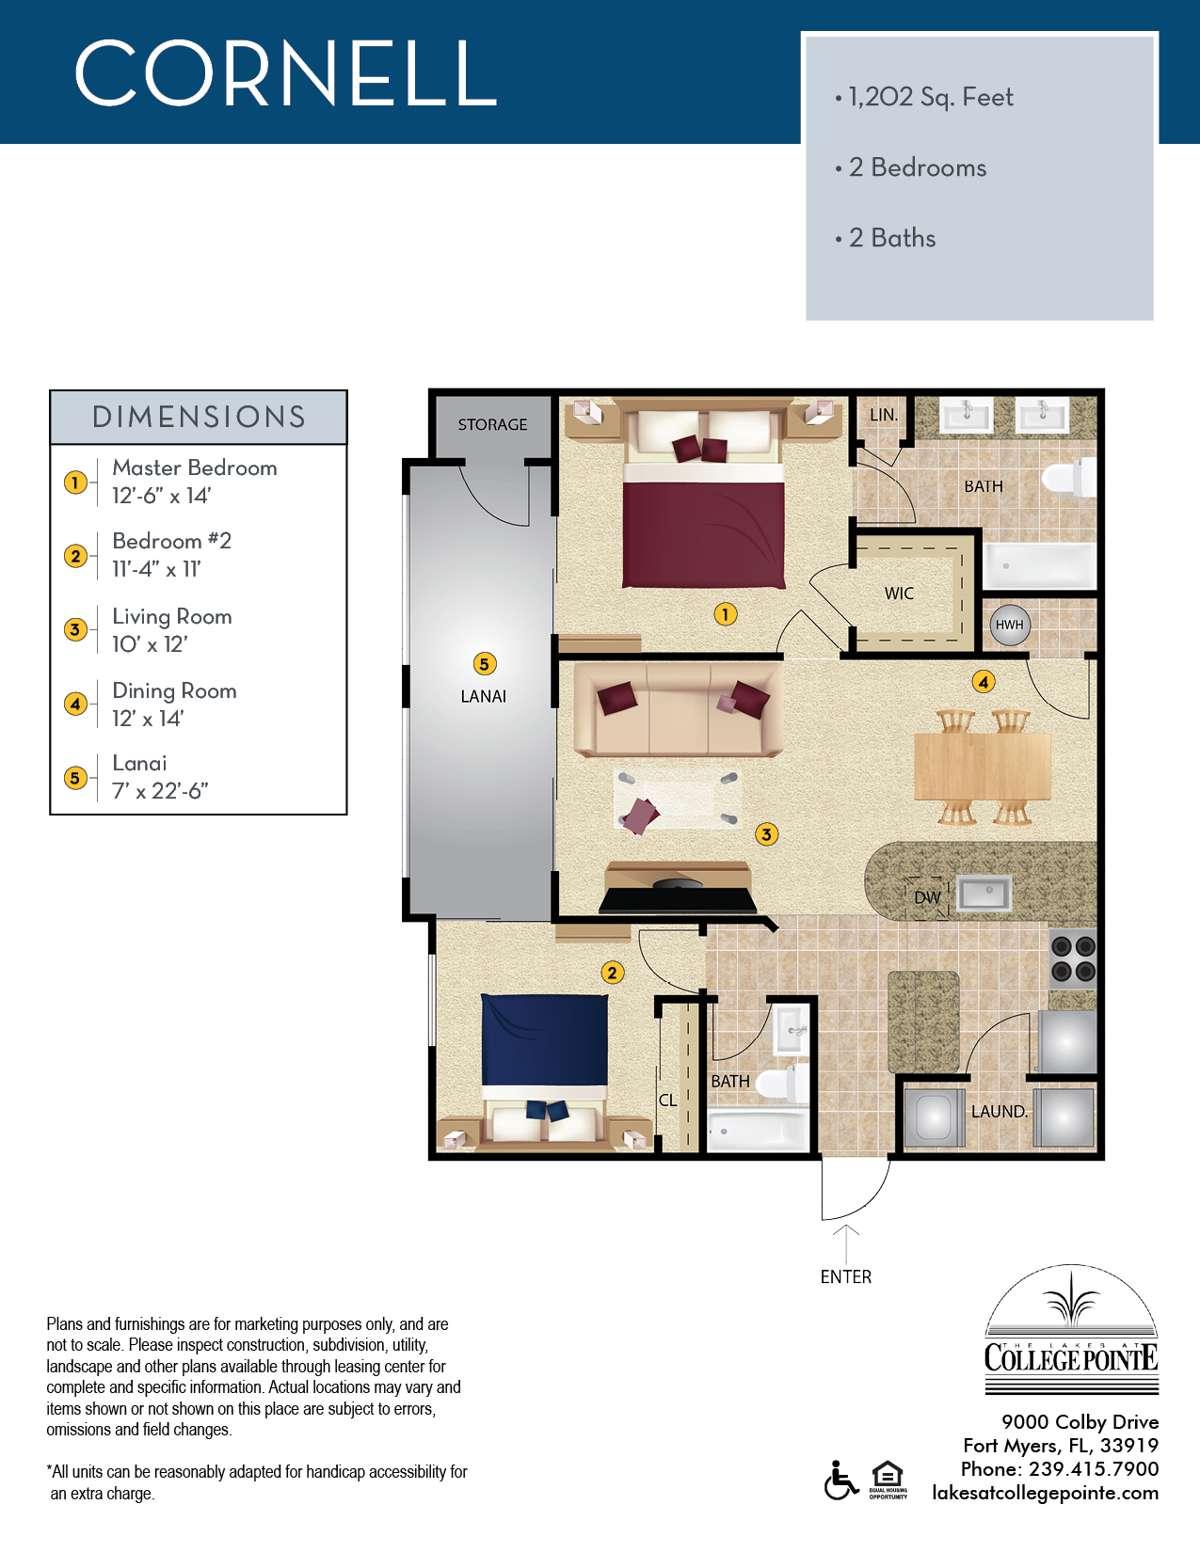 The Cornell Floor Plan